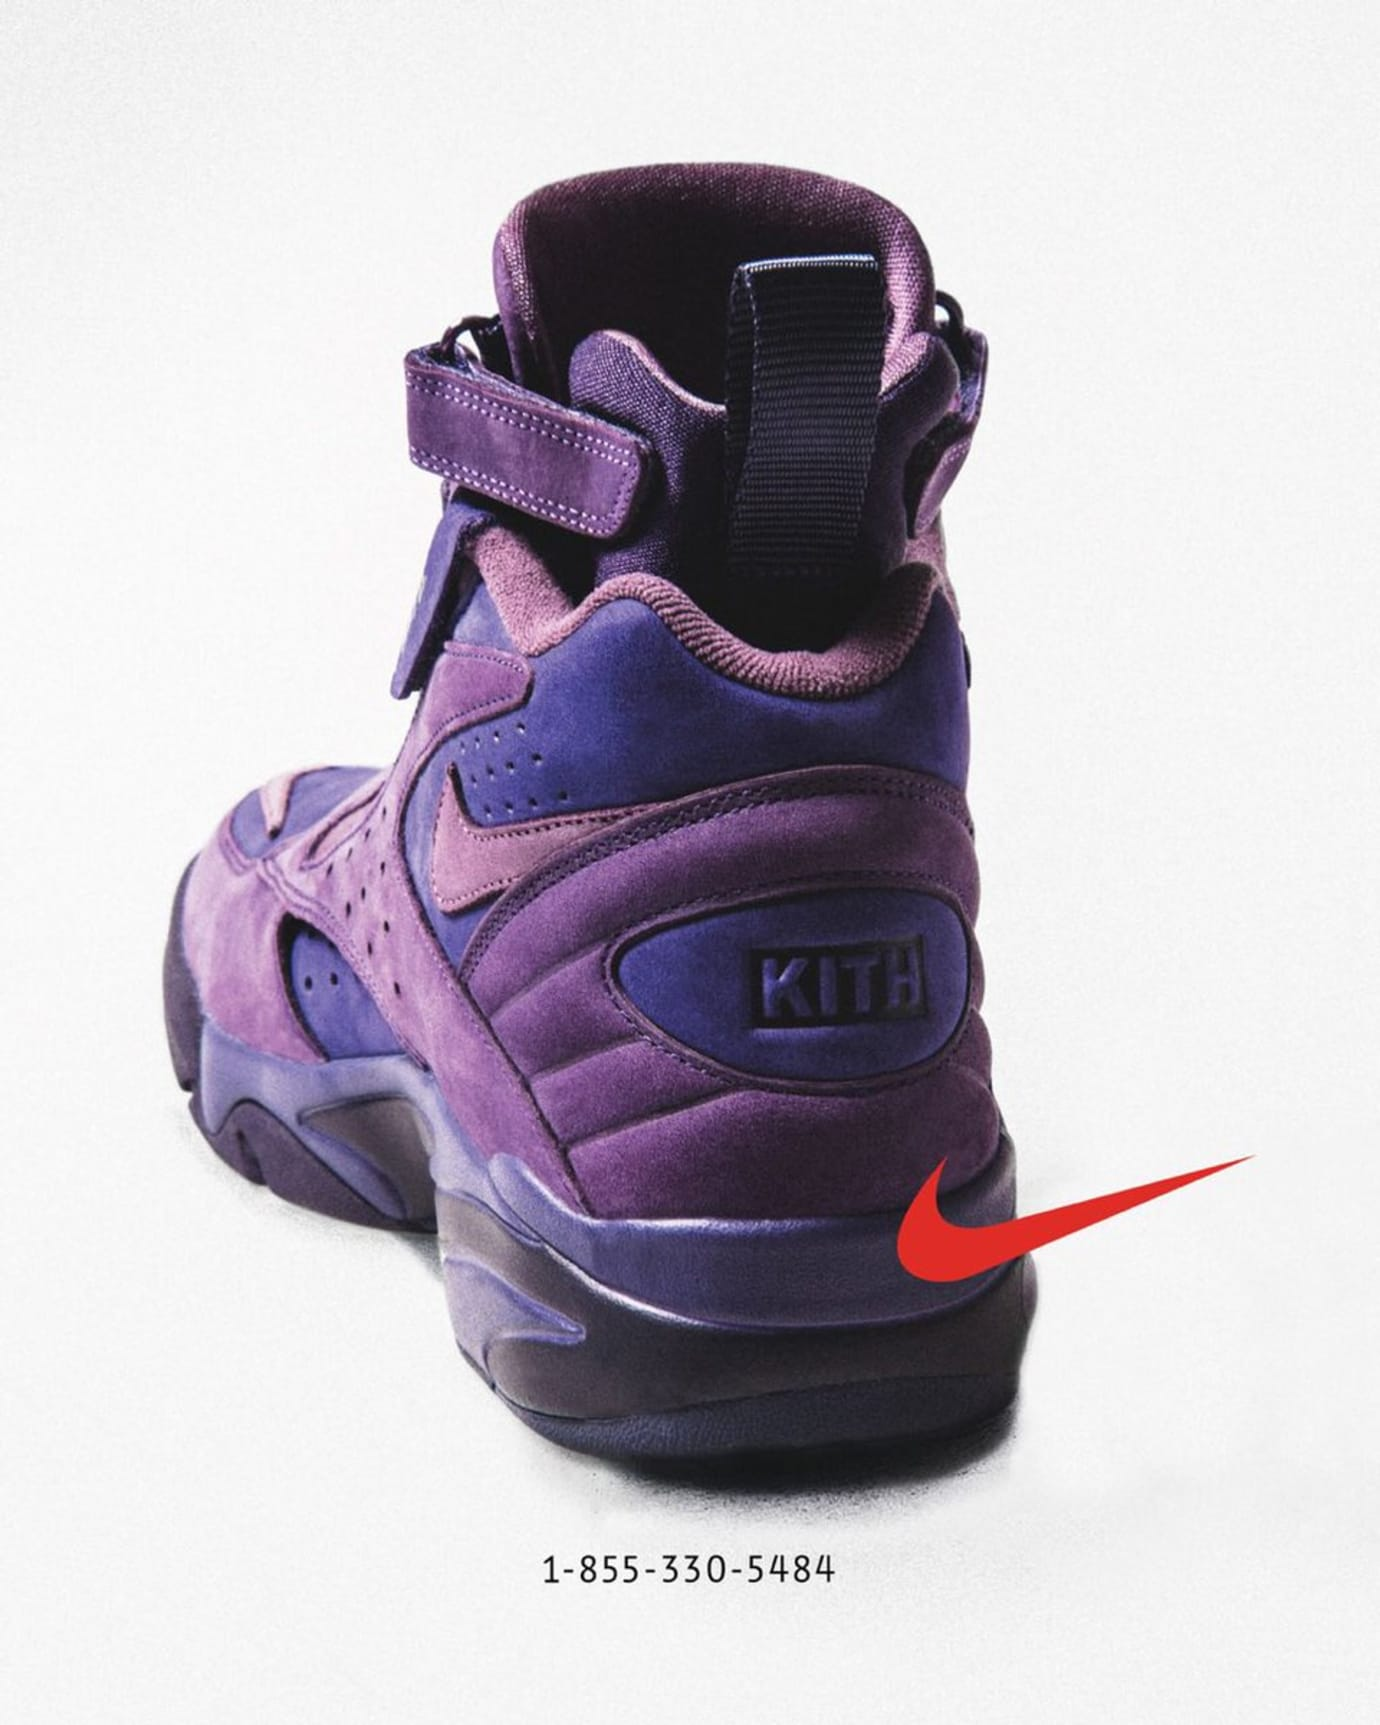 Kith Nike Maestro 2 High Purple